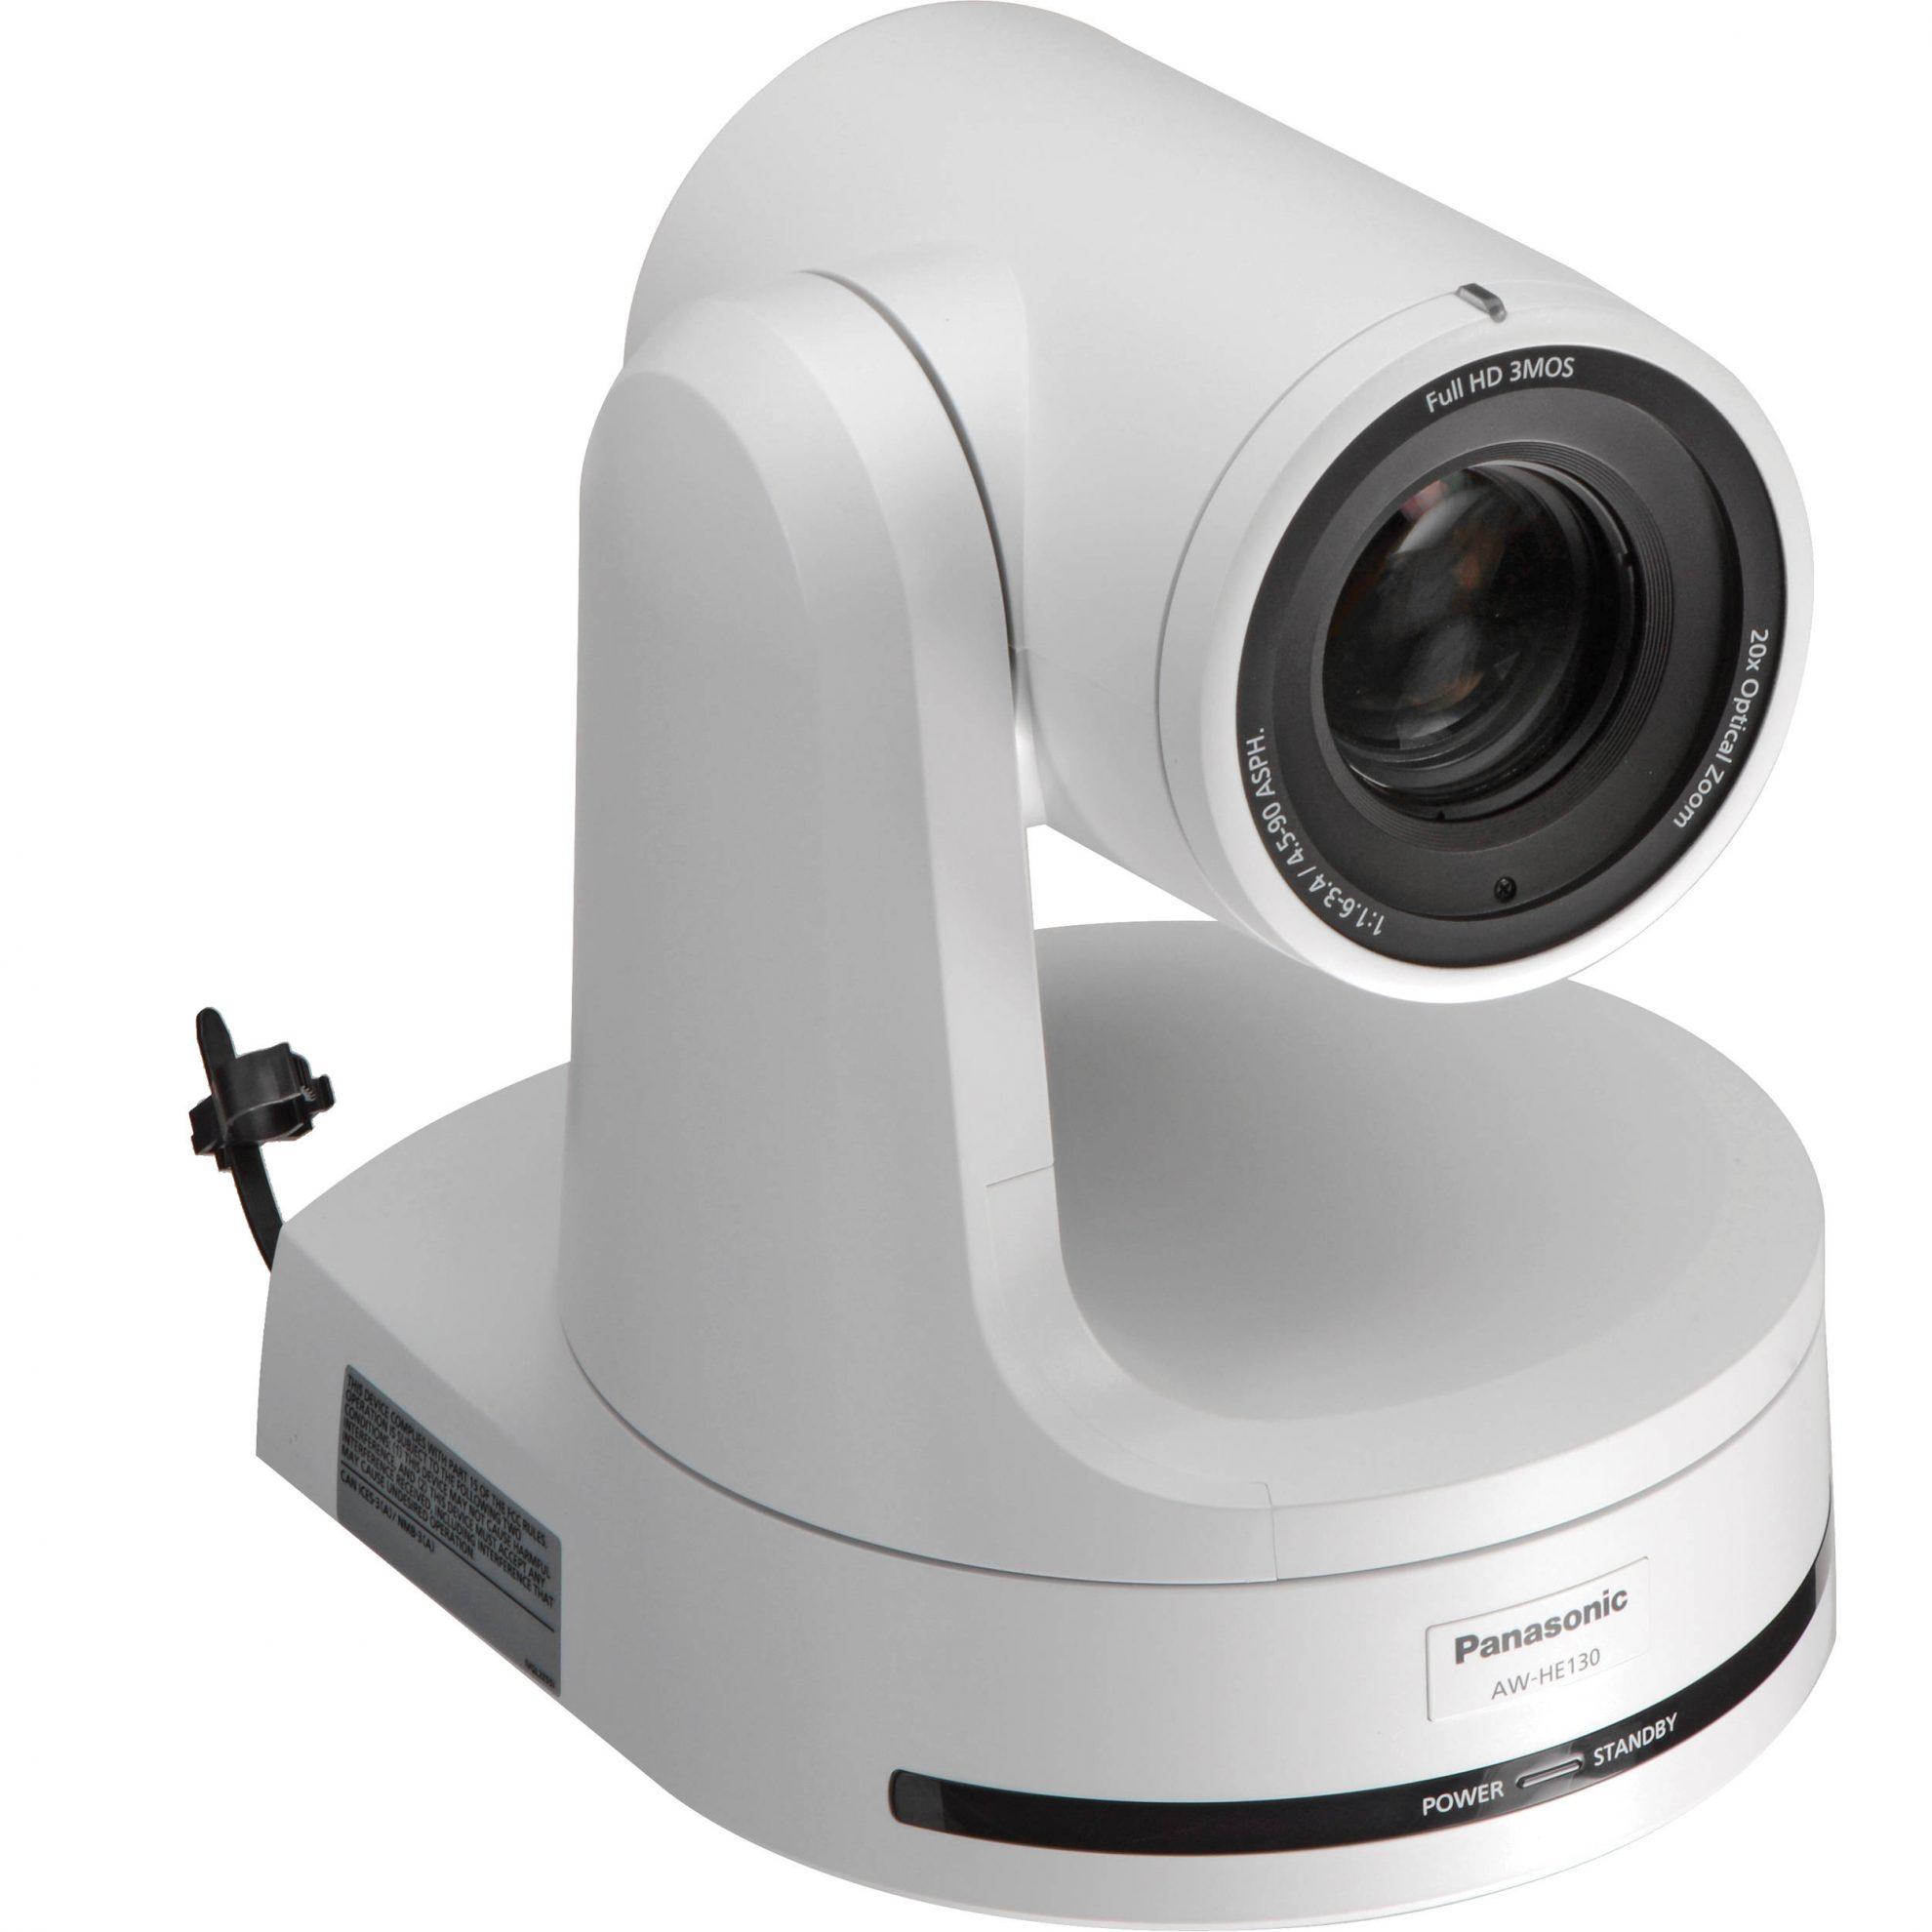 Panasonic to add NDI to new and current PTZ cameras